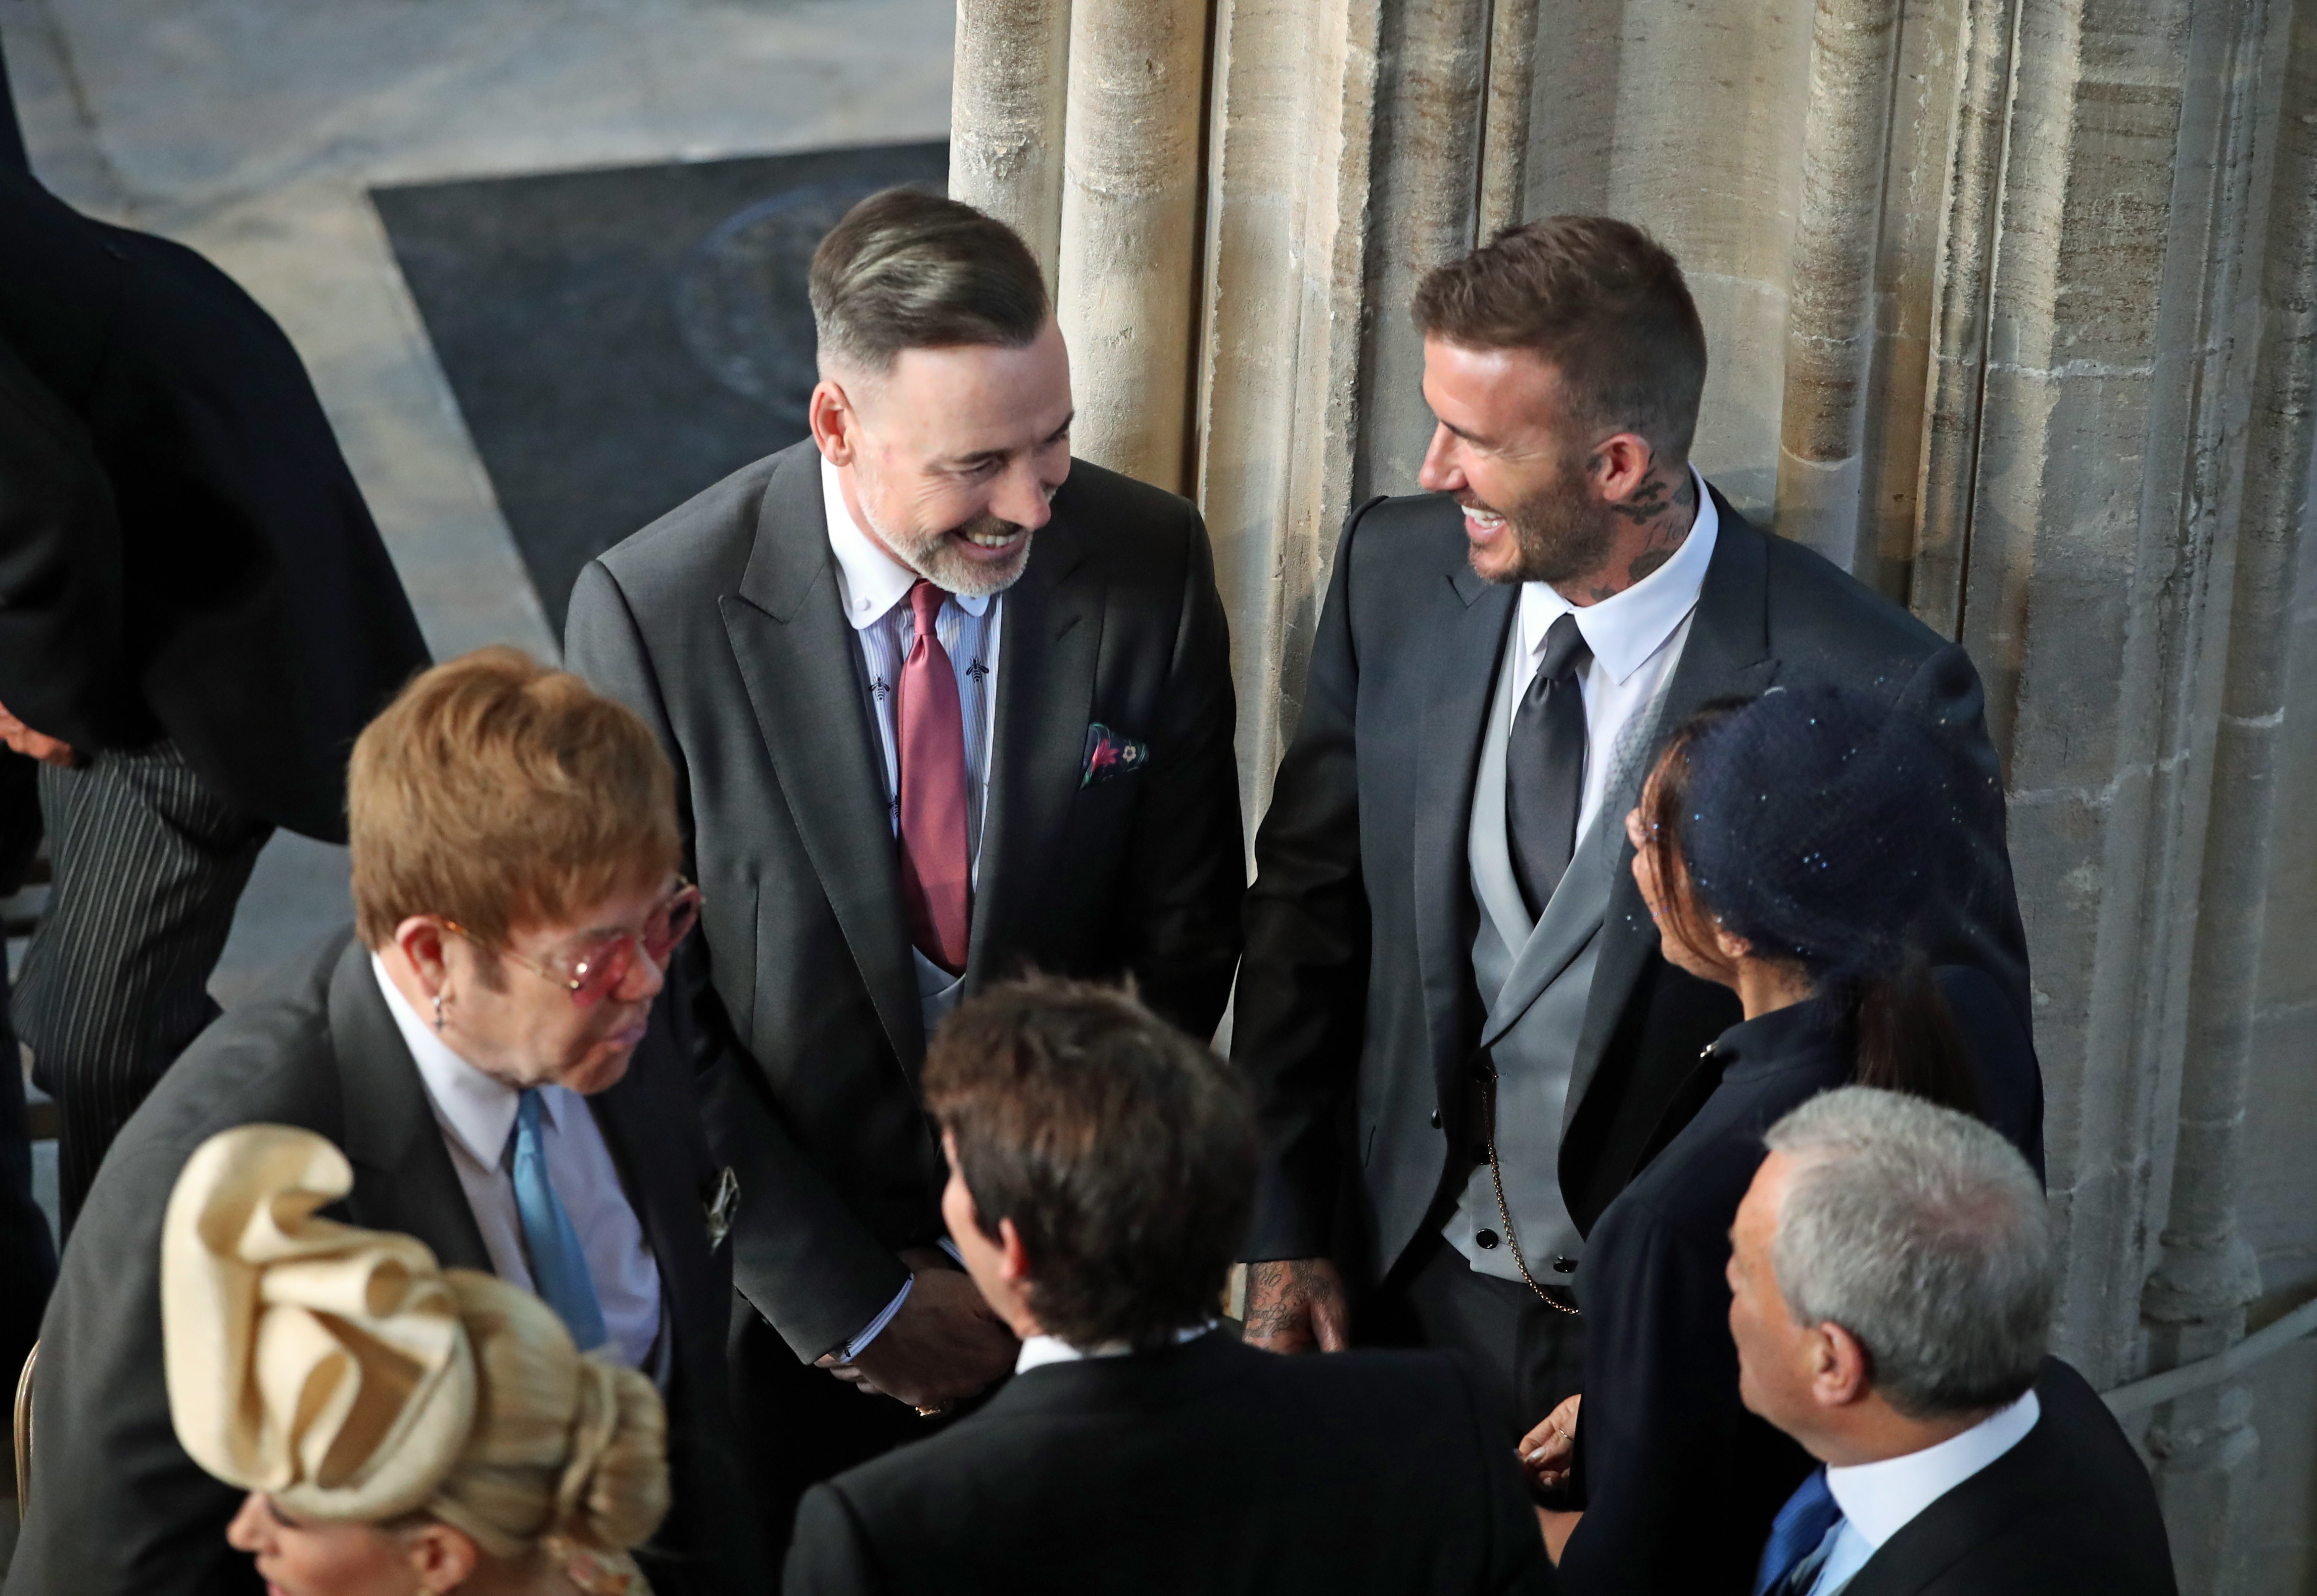 86f83e2c67 See Elton John arrive at royal wedding - CNN Video